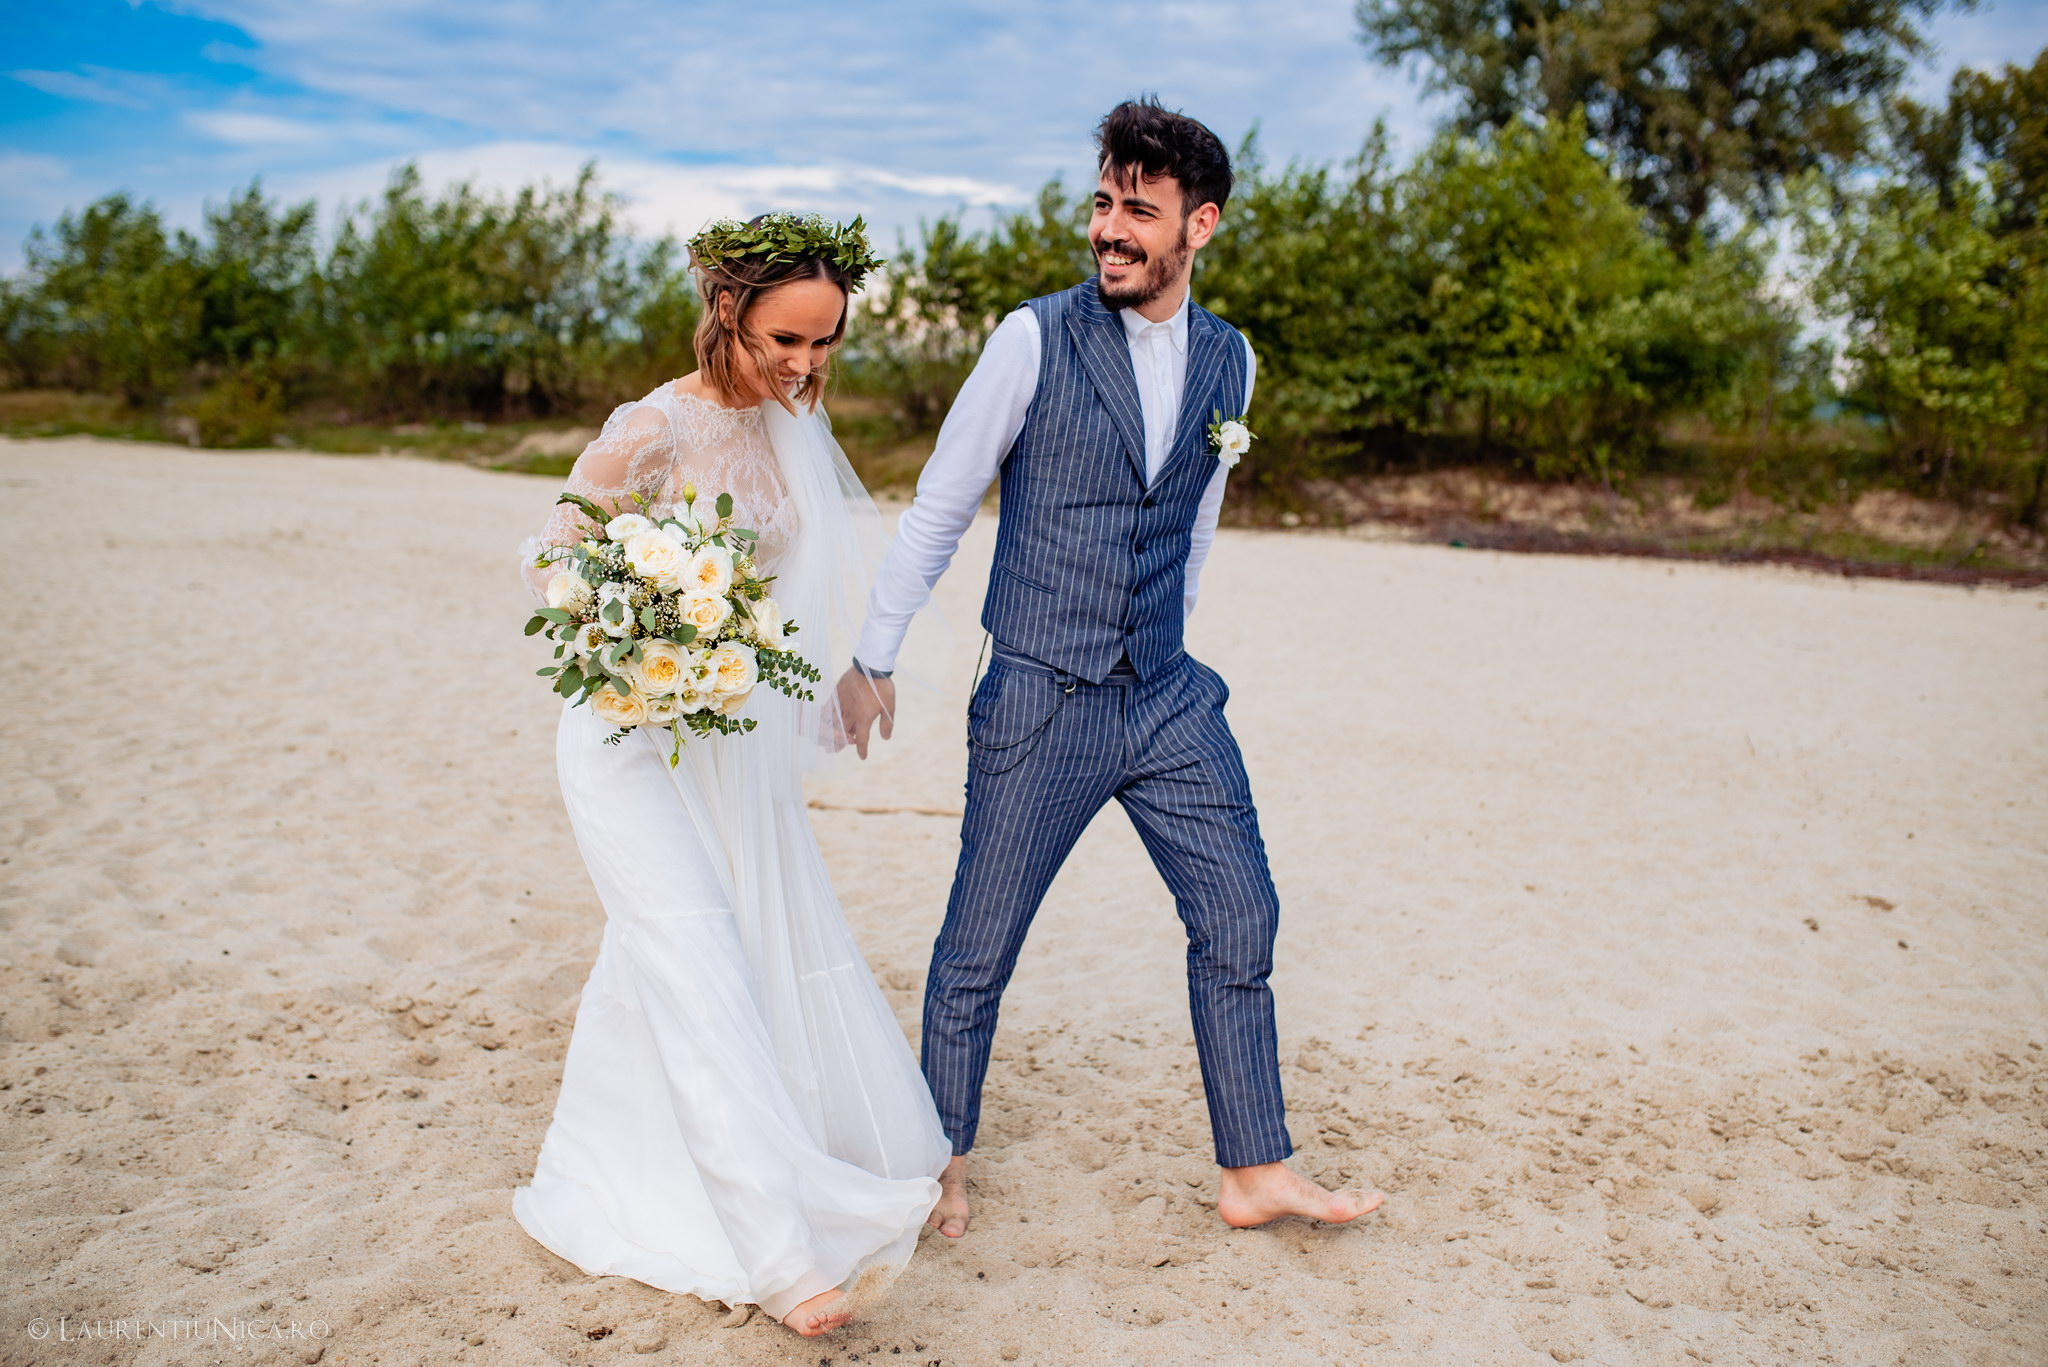 20180915 LN 0534 - Diana & Marius | Fotografii nunta | Slatina